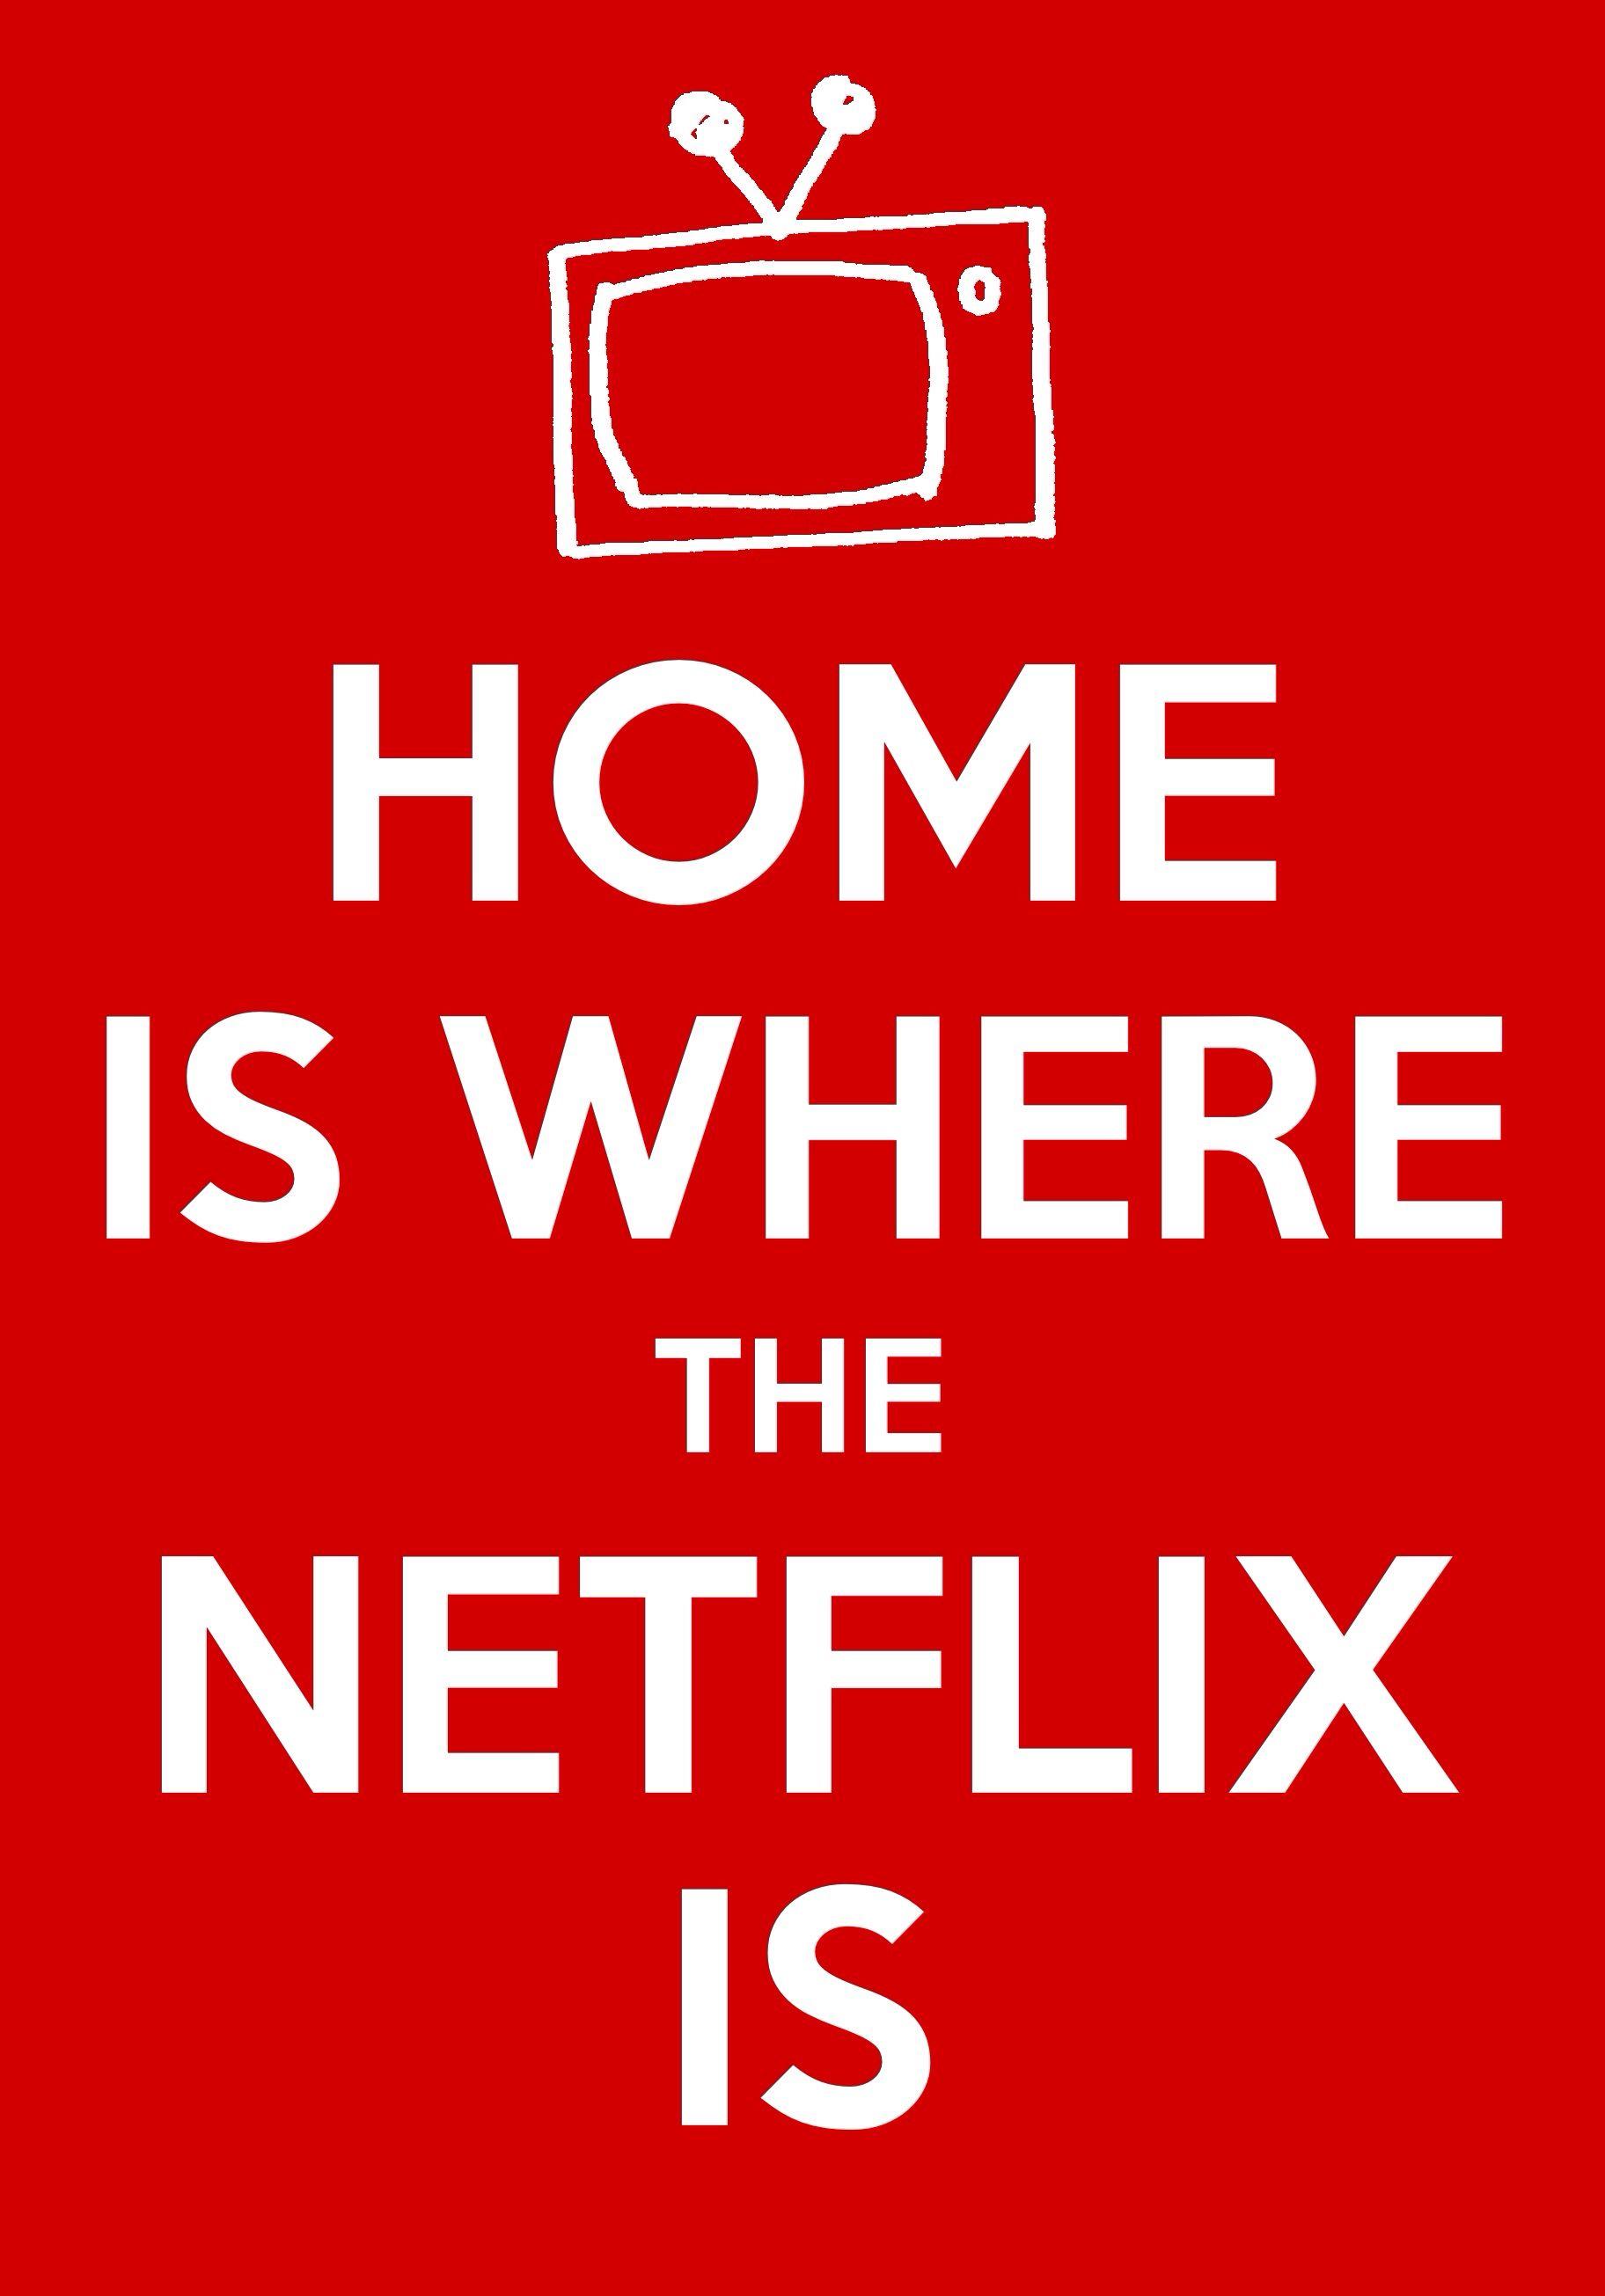 Home is where the Netflix is! Netflix humor, Netflix